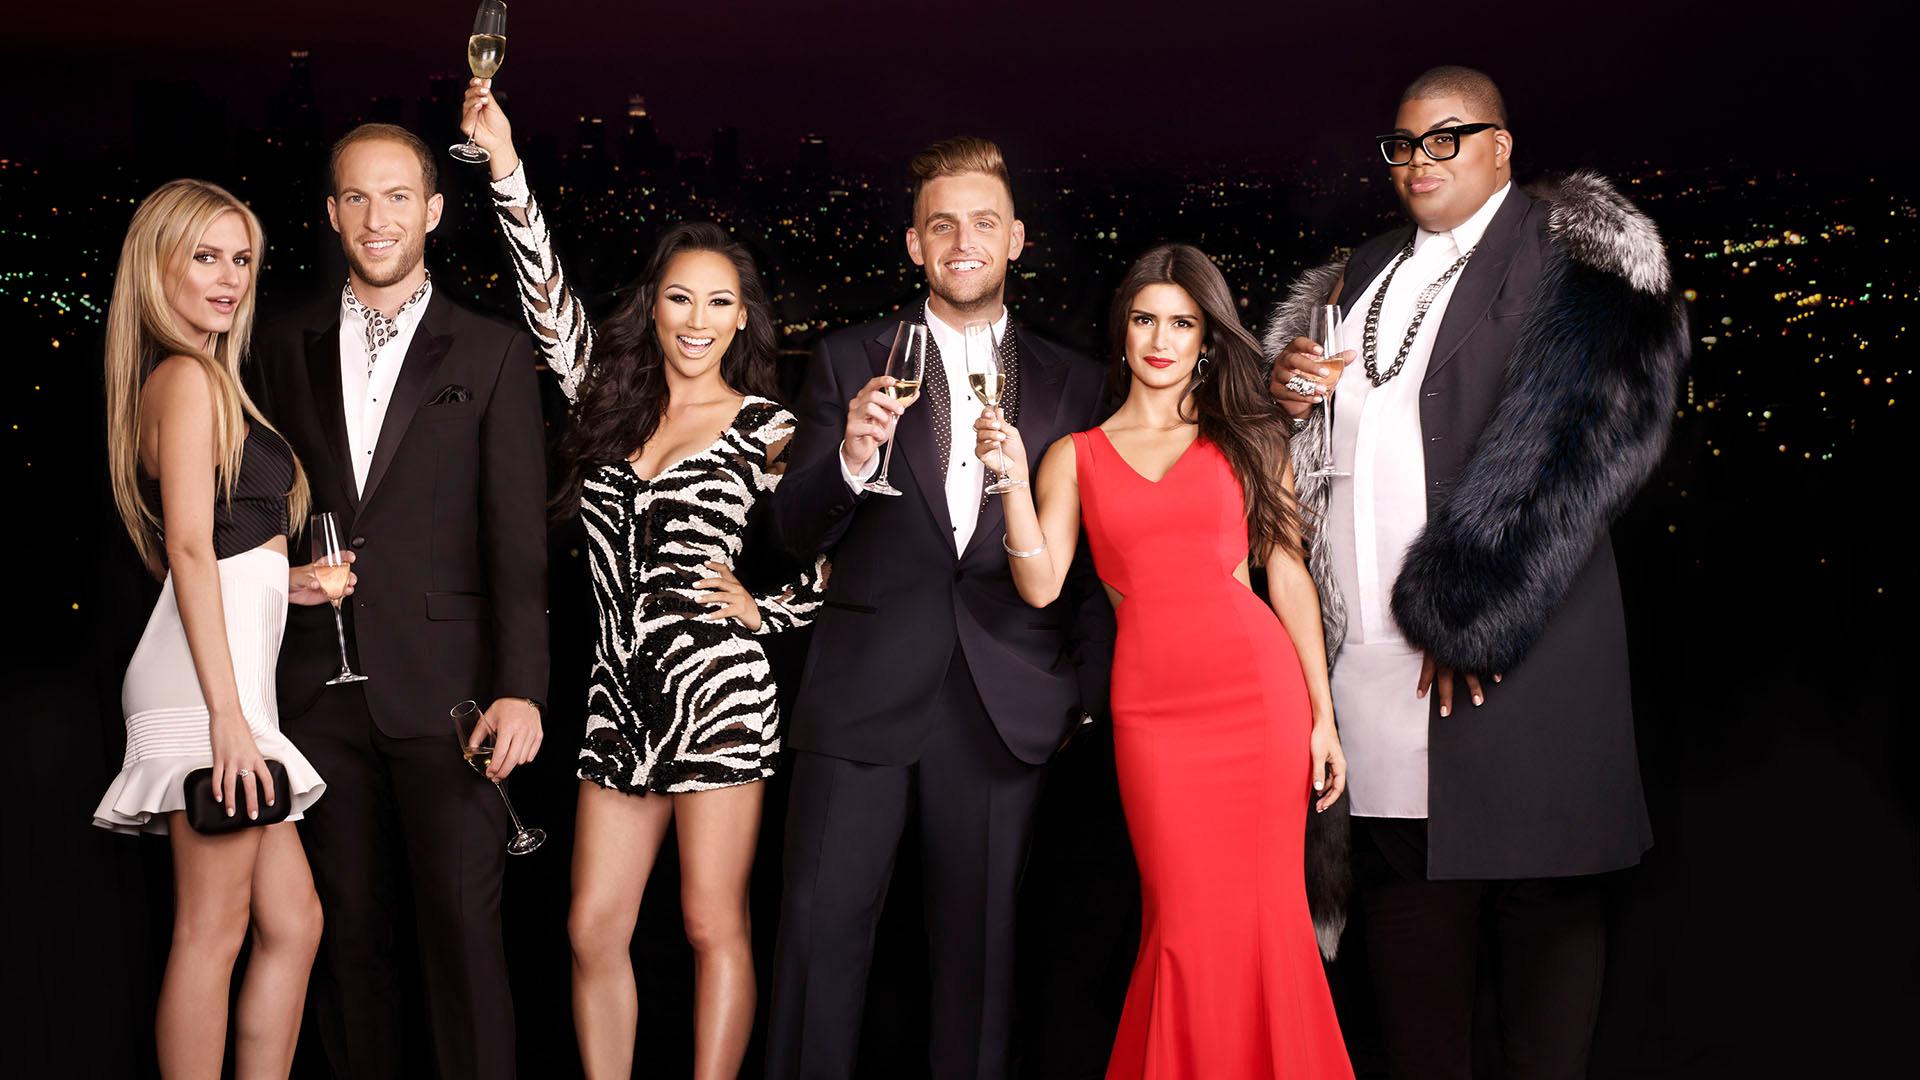 Show #RichKids of Beverly Hills